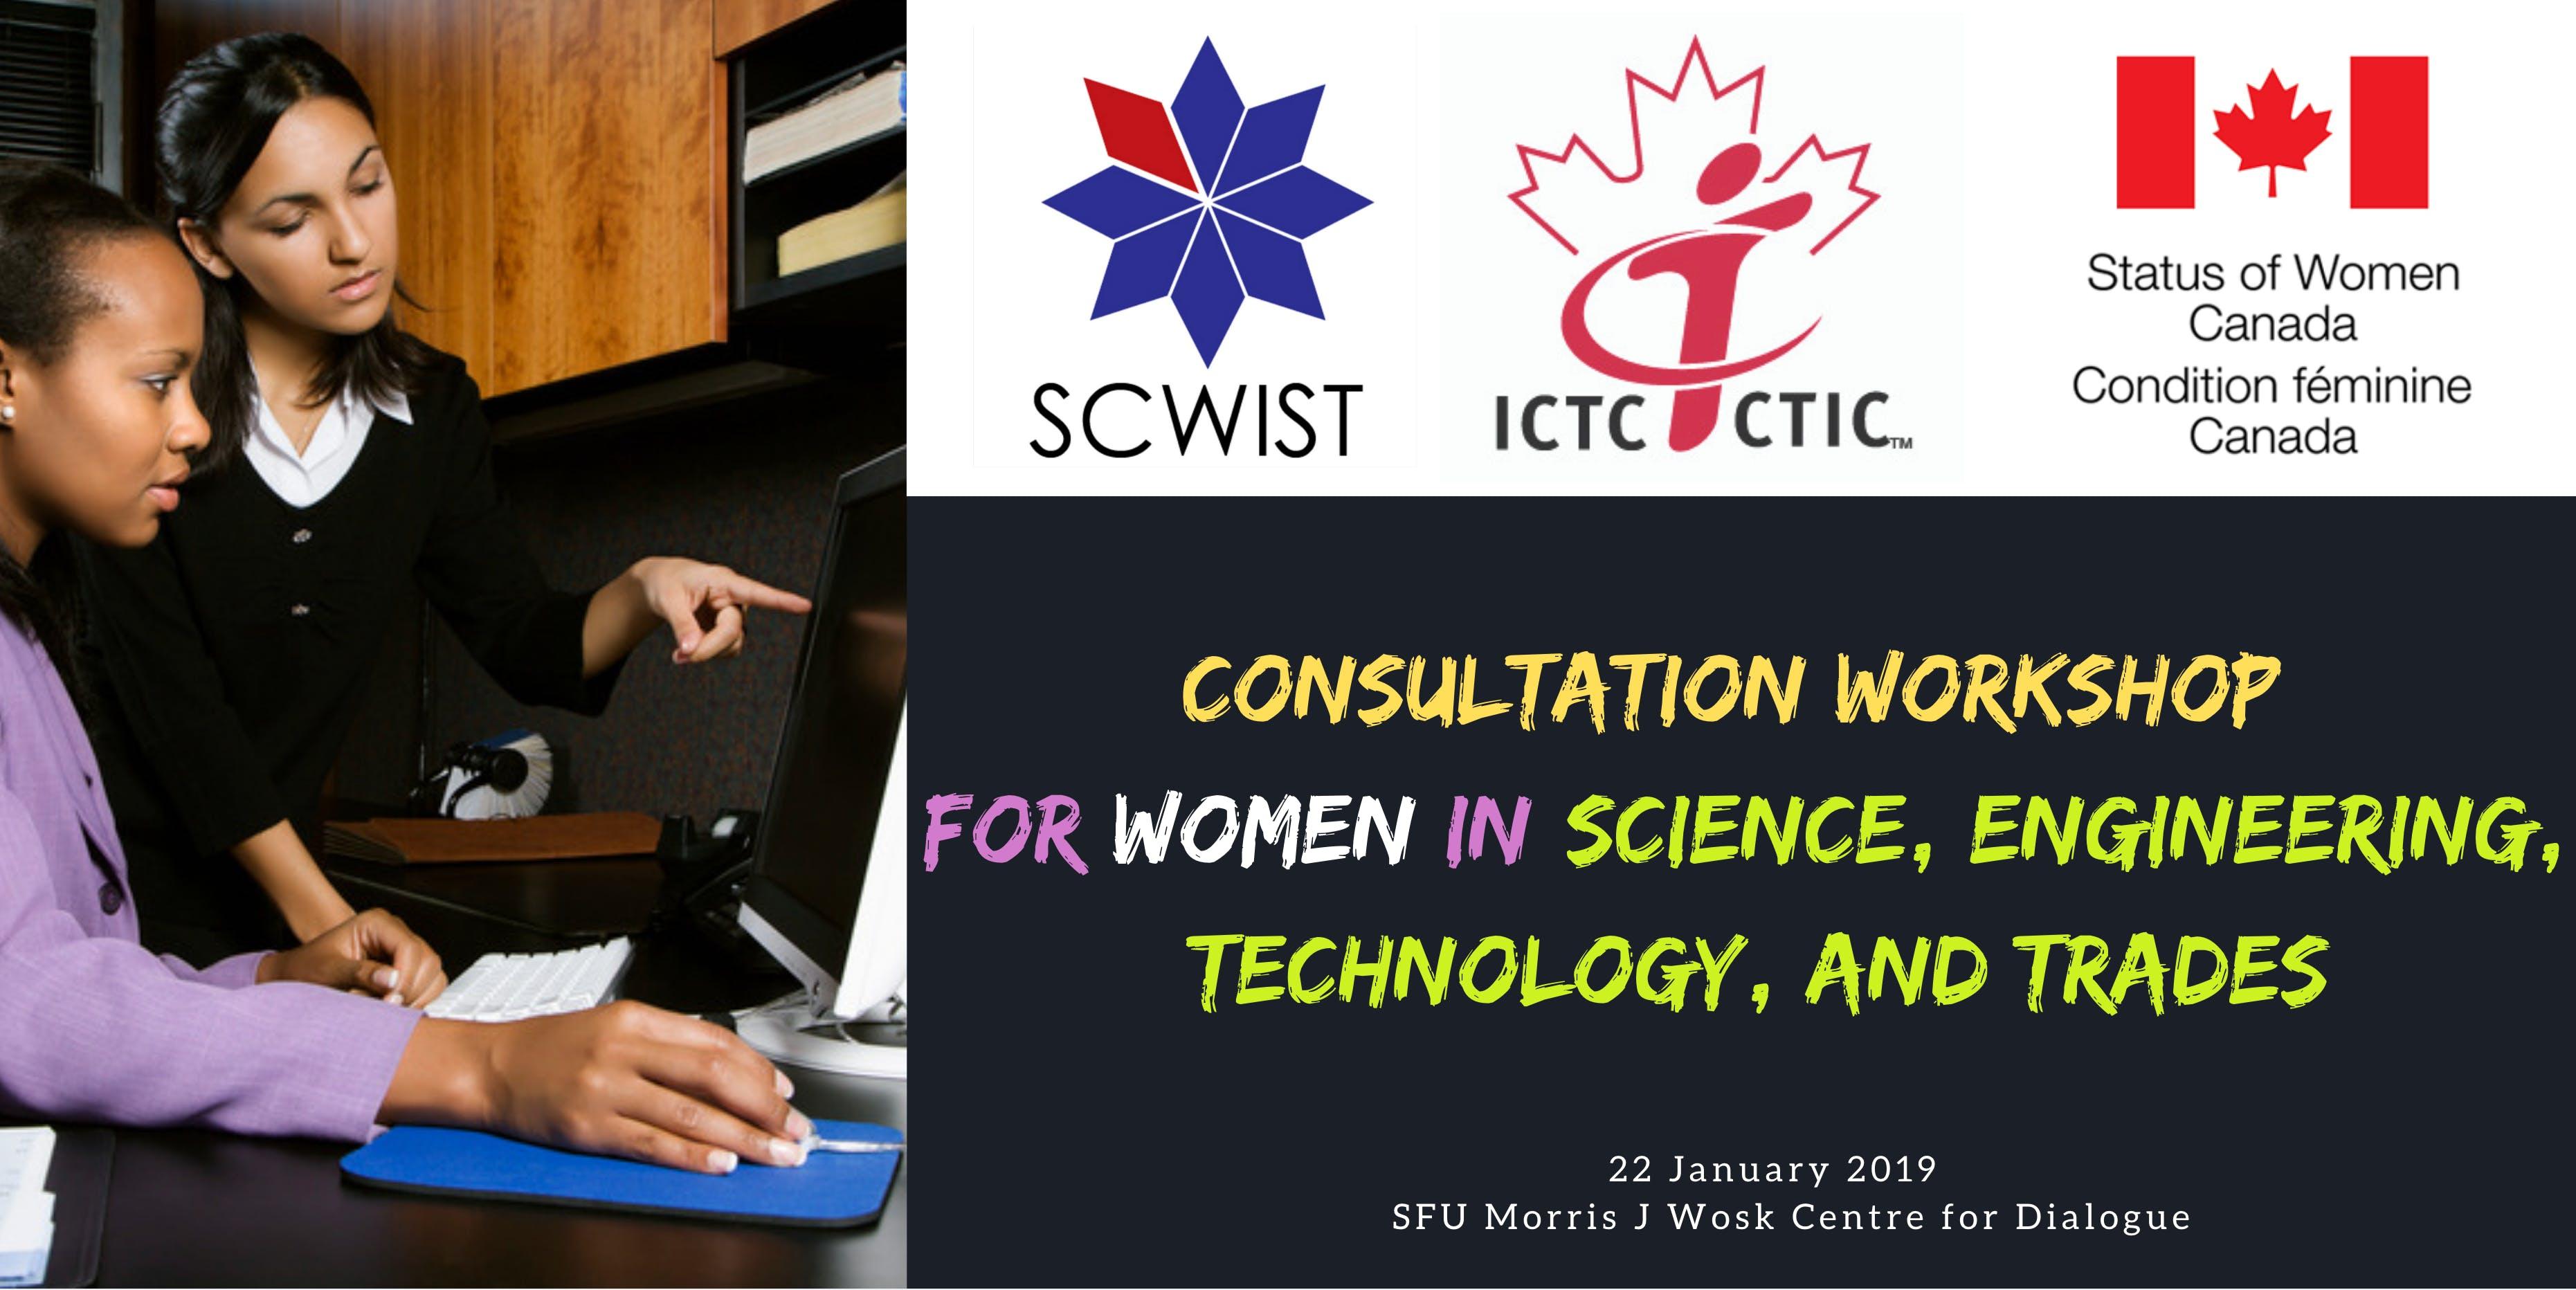 ICTC Women's Roundtable Workshop